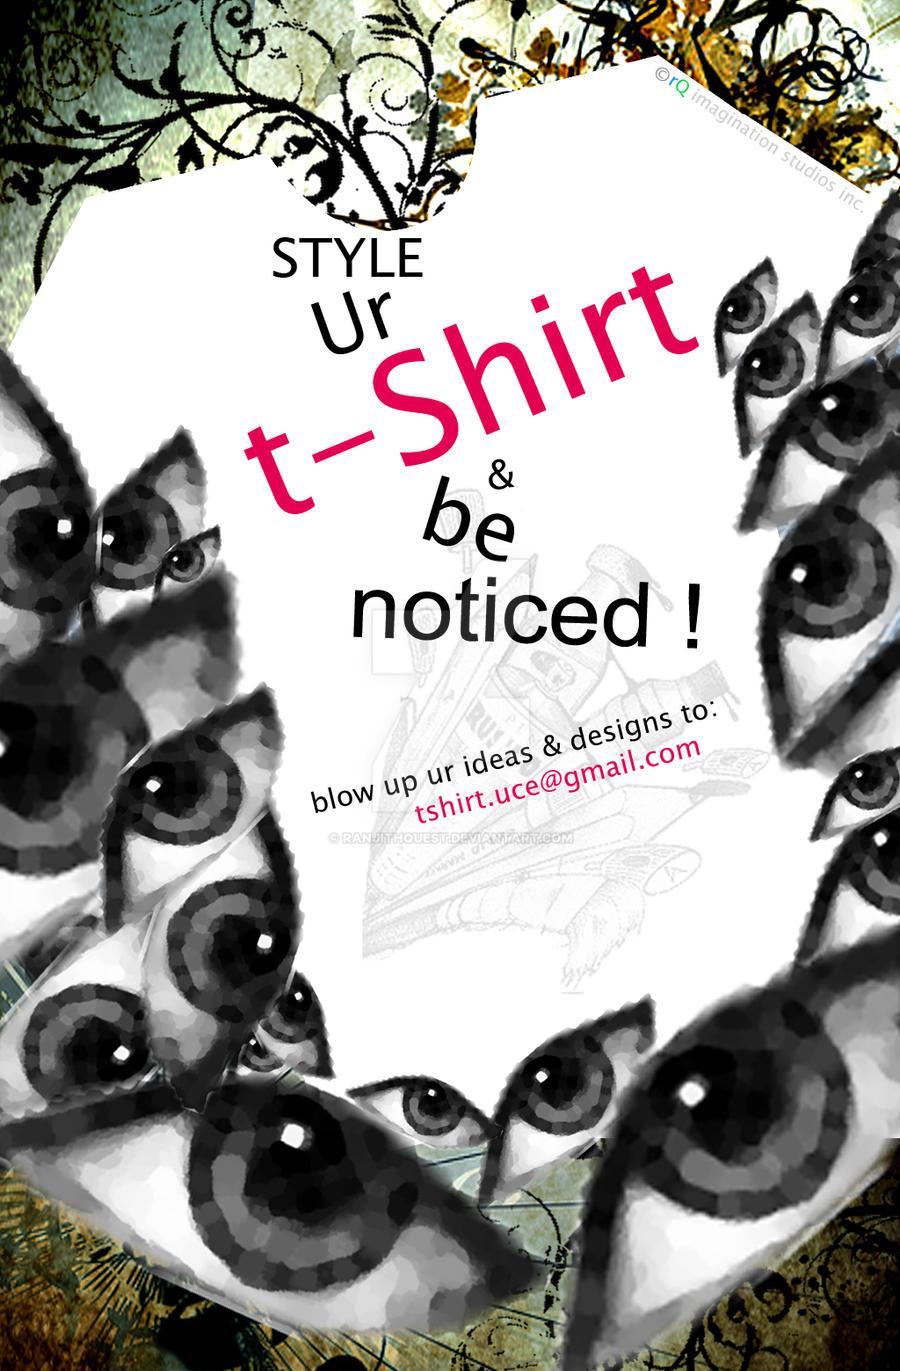 T shirt poster design -  T Shirt Design Poster By Ranjithquest